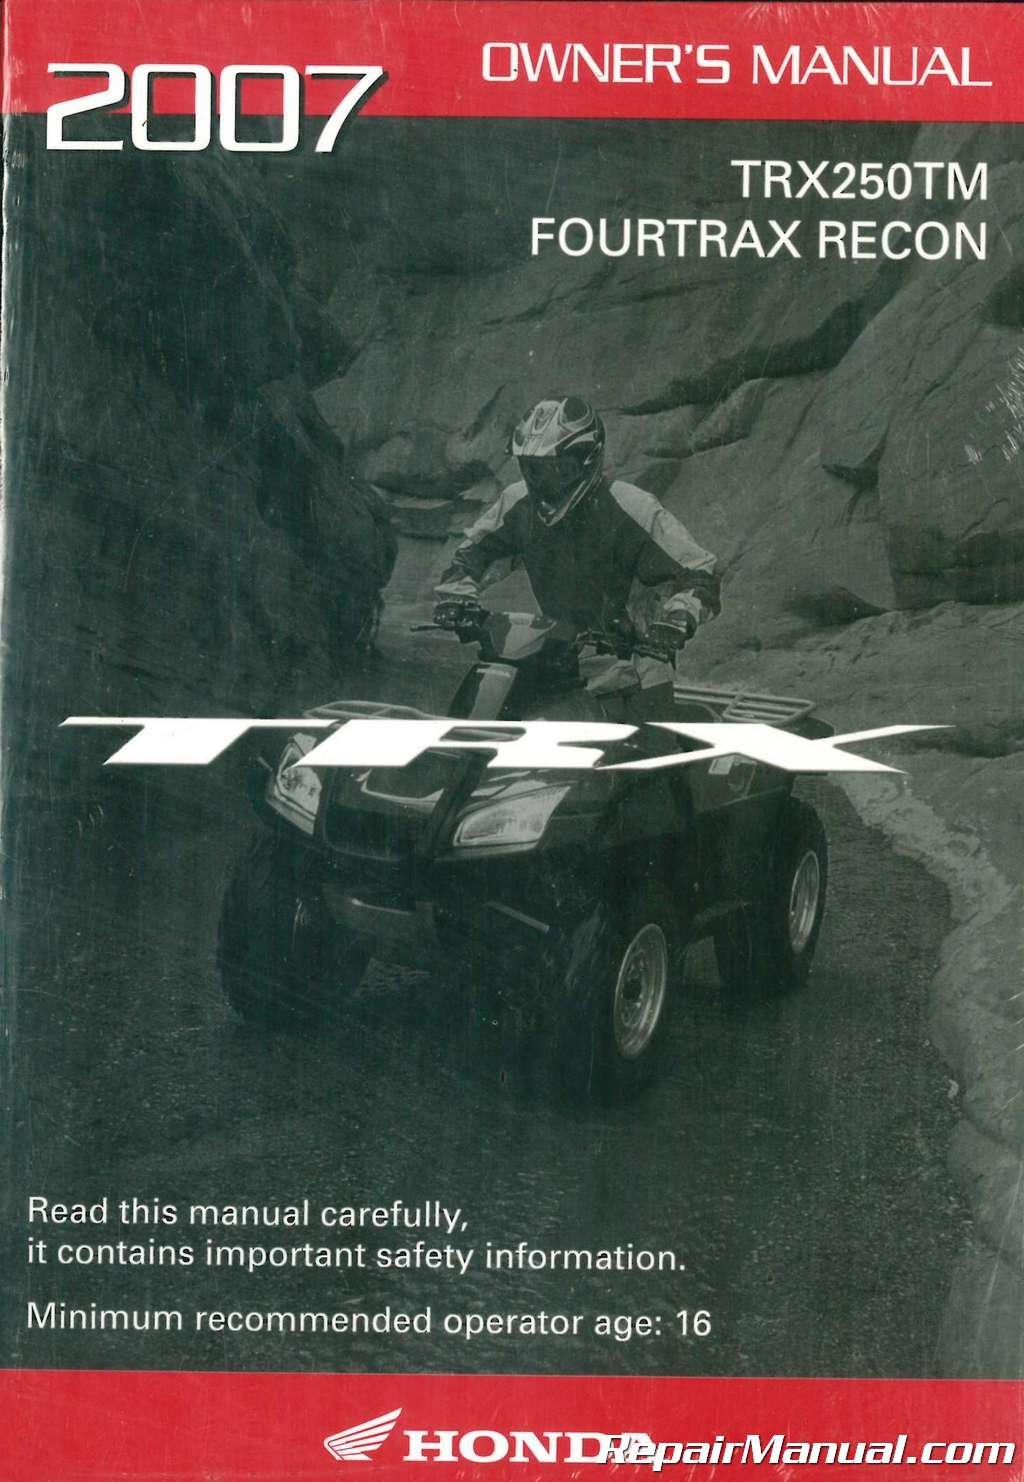 Honda Recon For Sale >> 2007 Honda TRX250TM FourTrax Recon ATV Owners Manual